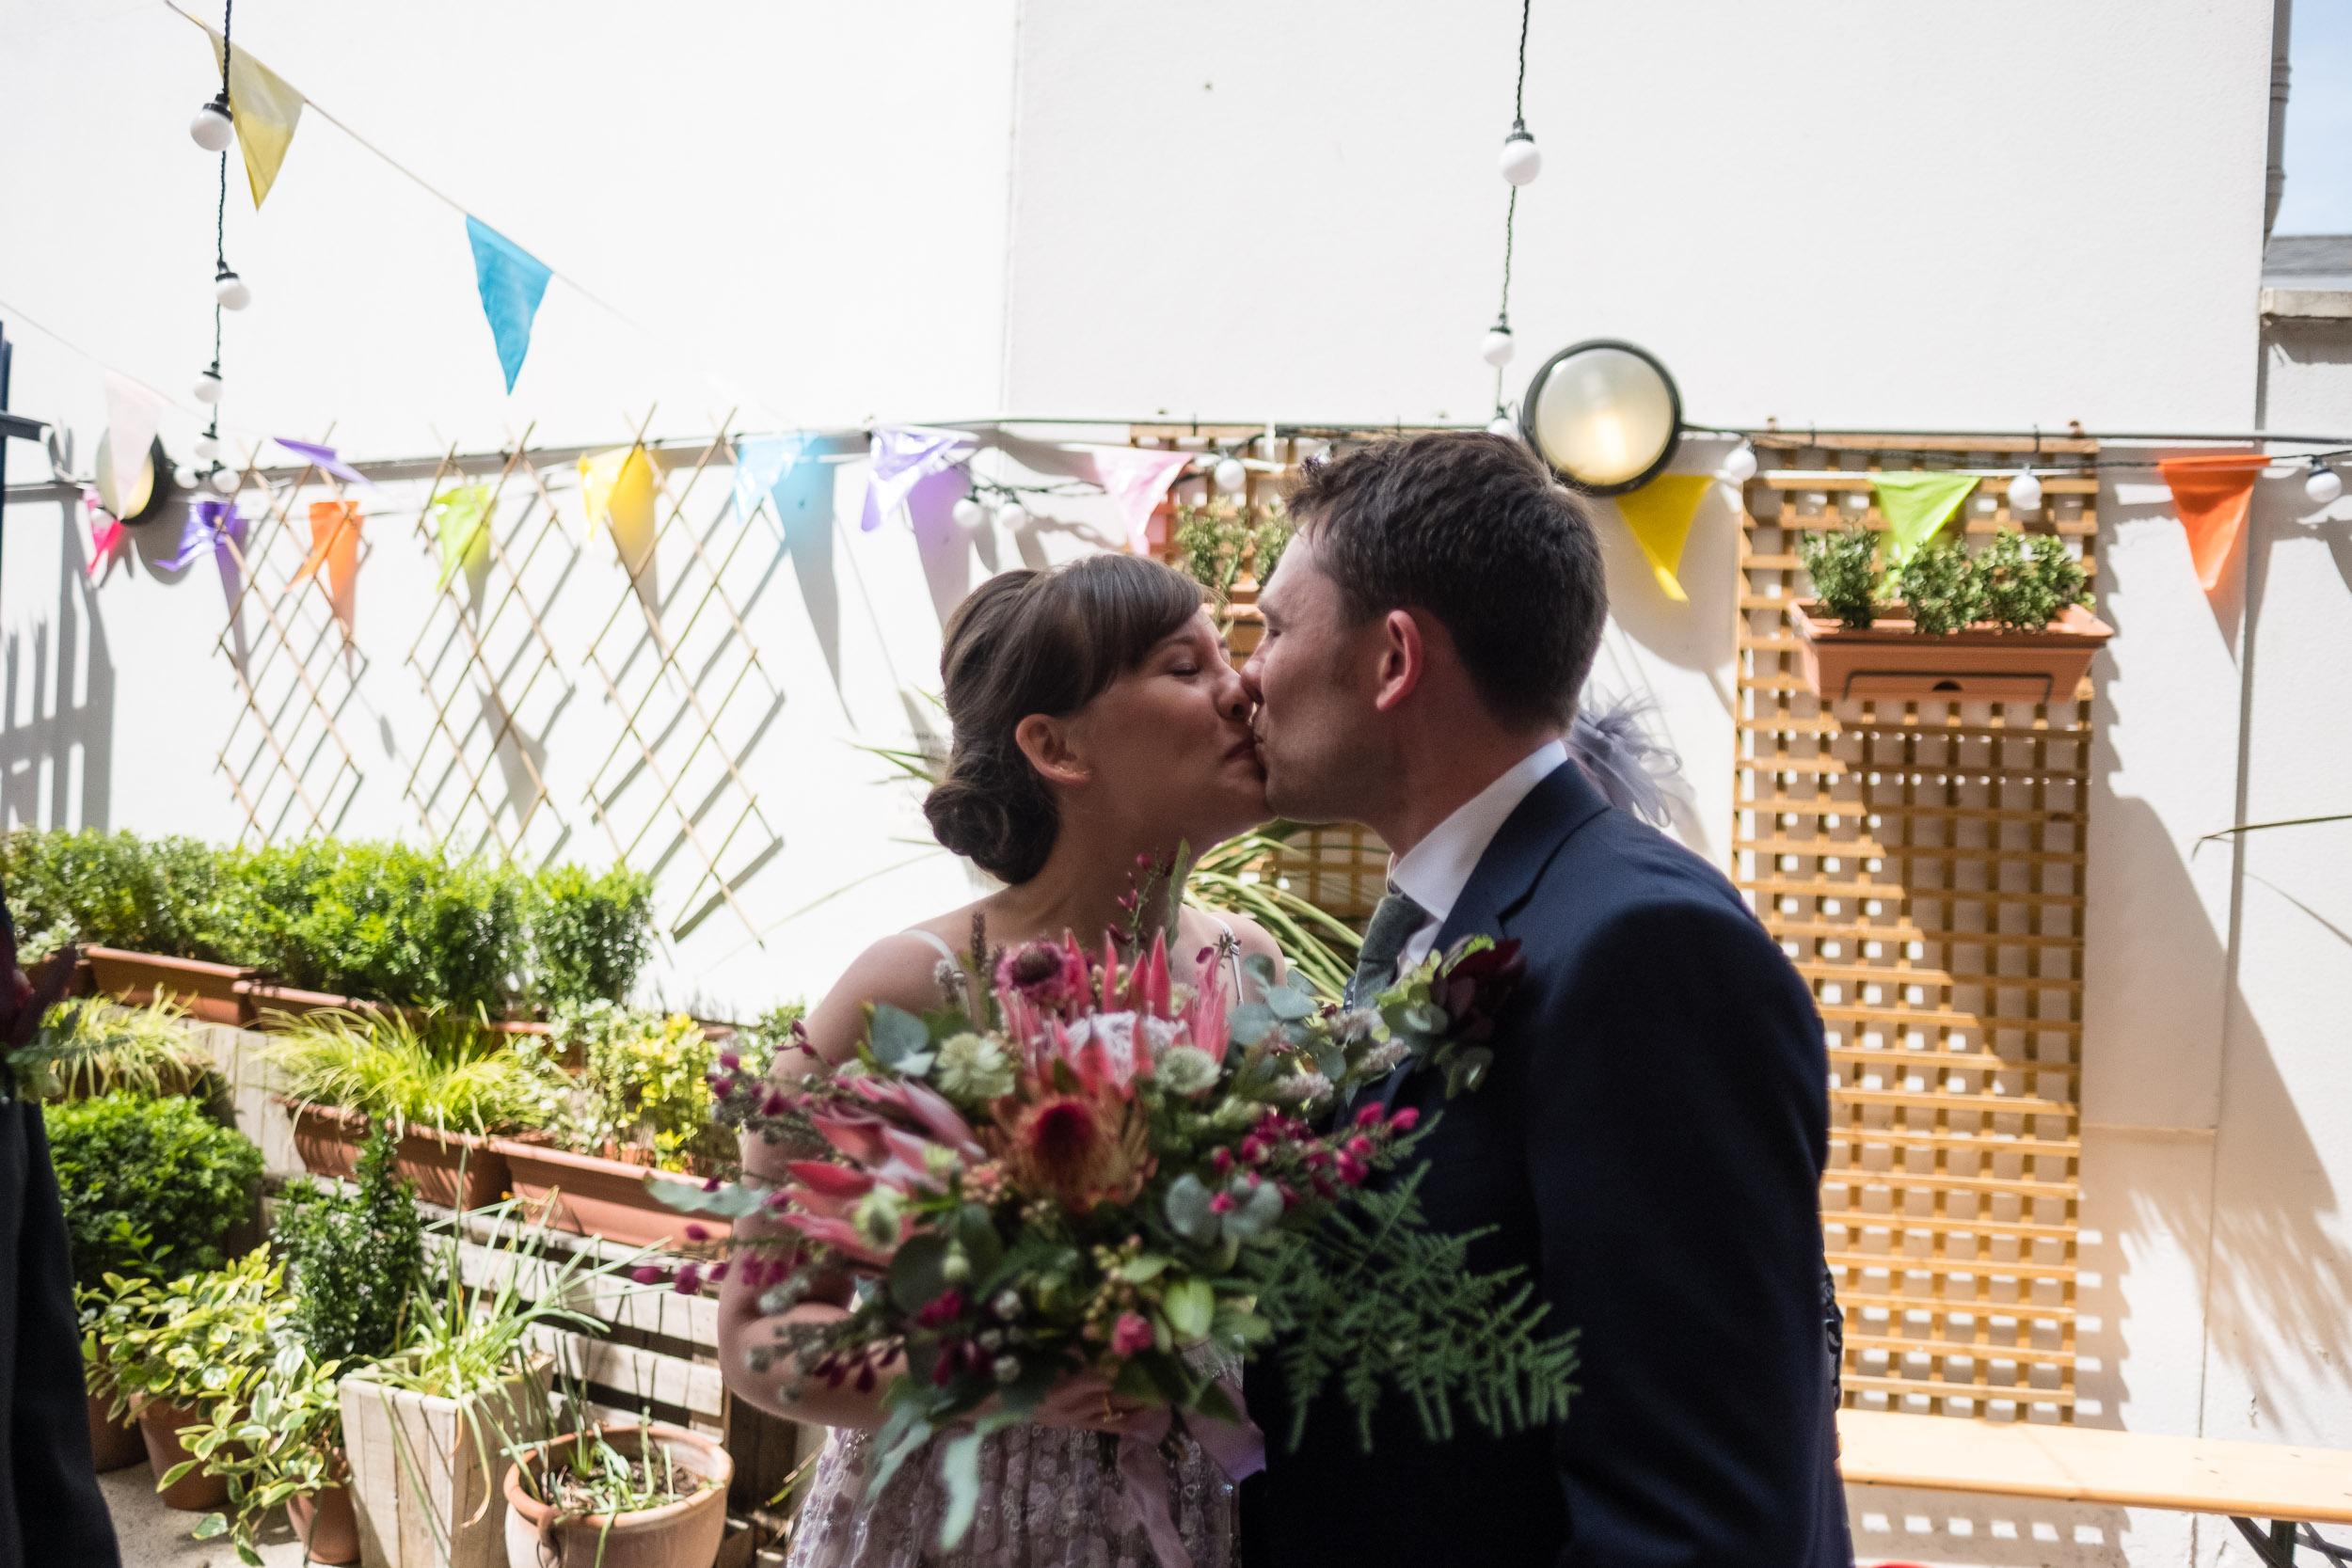 brockwell-lido-brixton-herne-hill-wedding-049.jpg